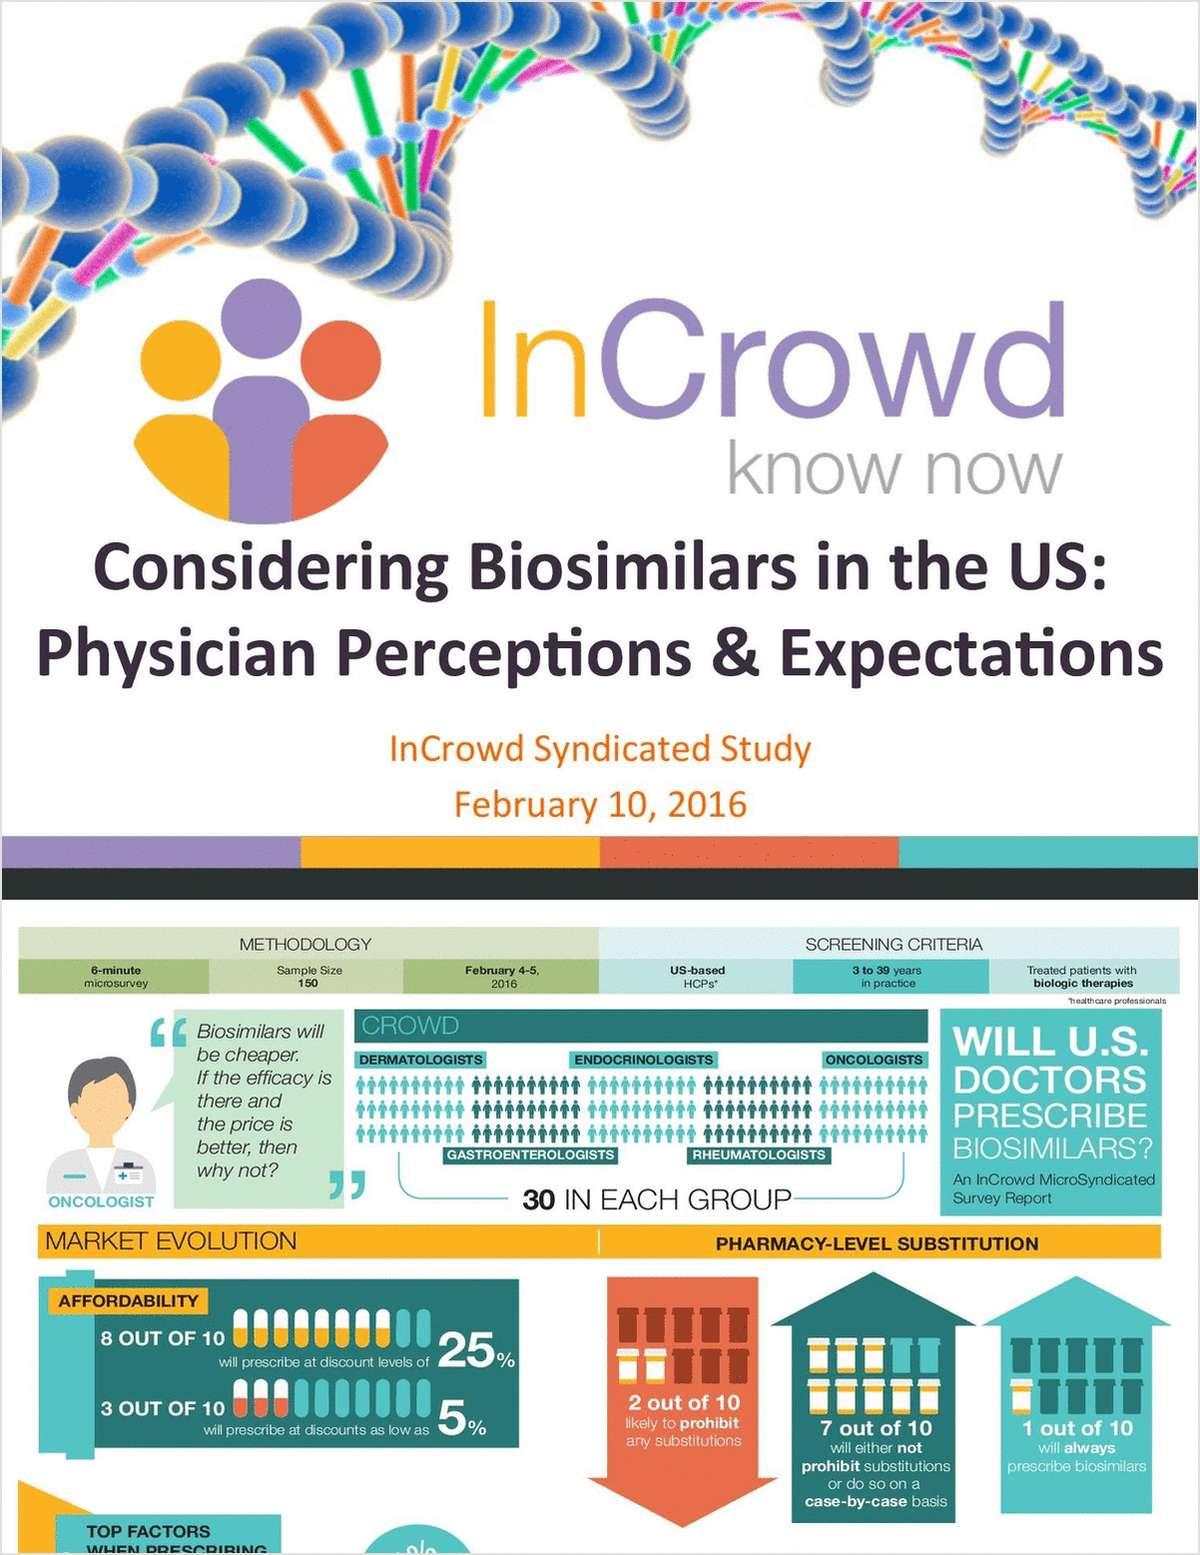 Will US Doctors Prescribe Biosimilars?